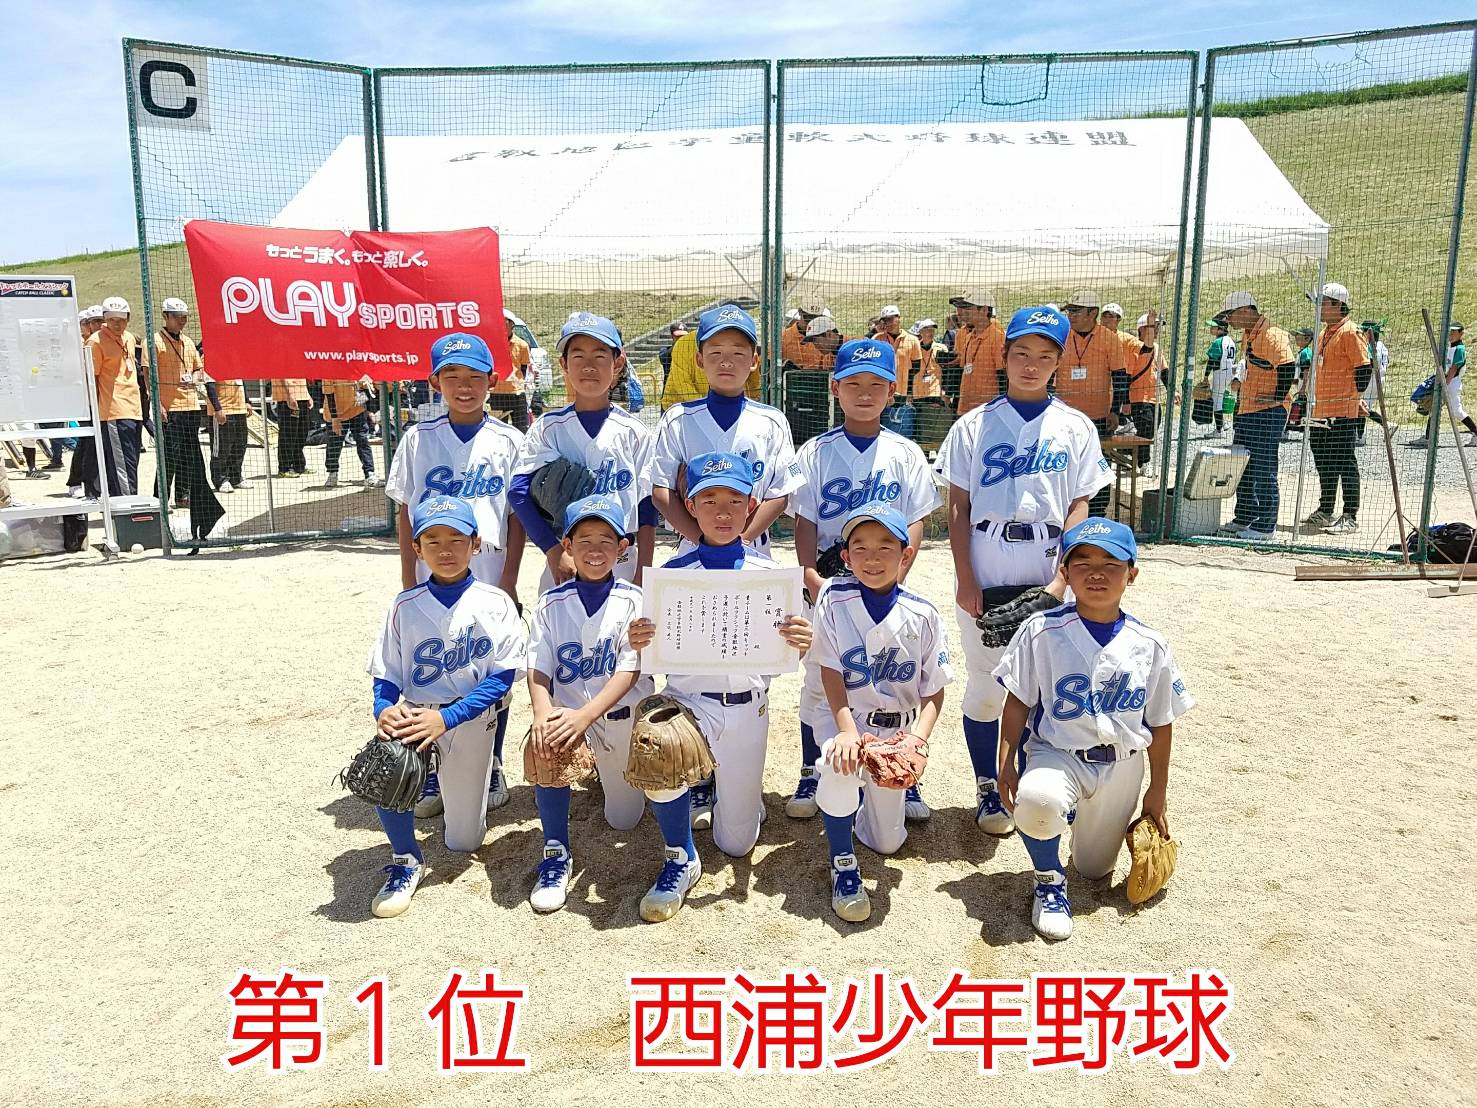 http://www.playsports.jp/news/images/7988747579074.jpg